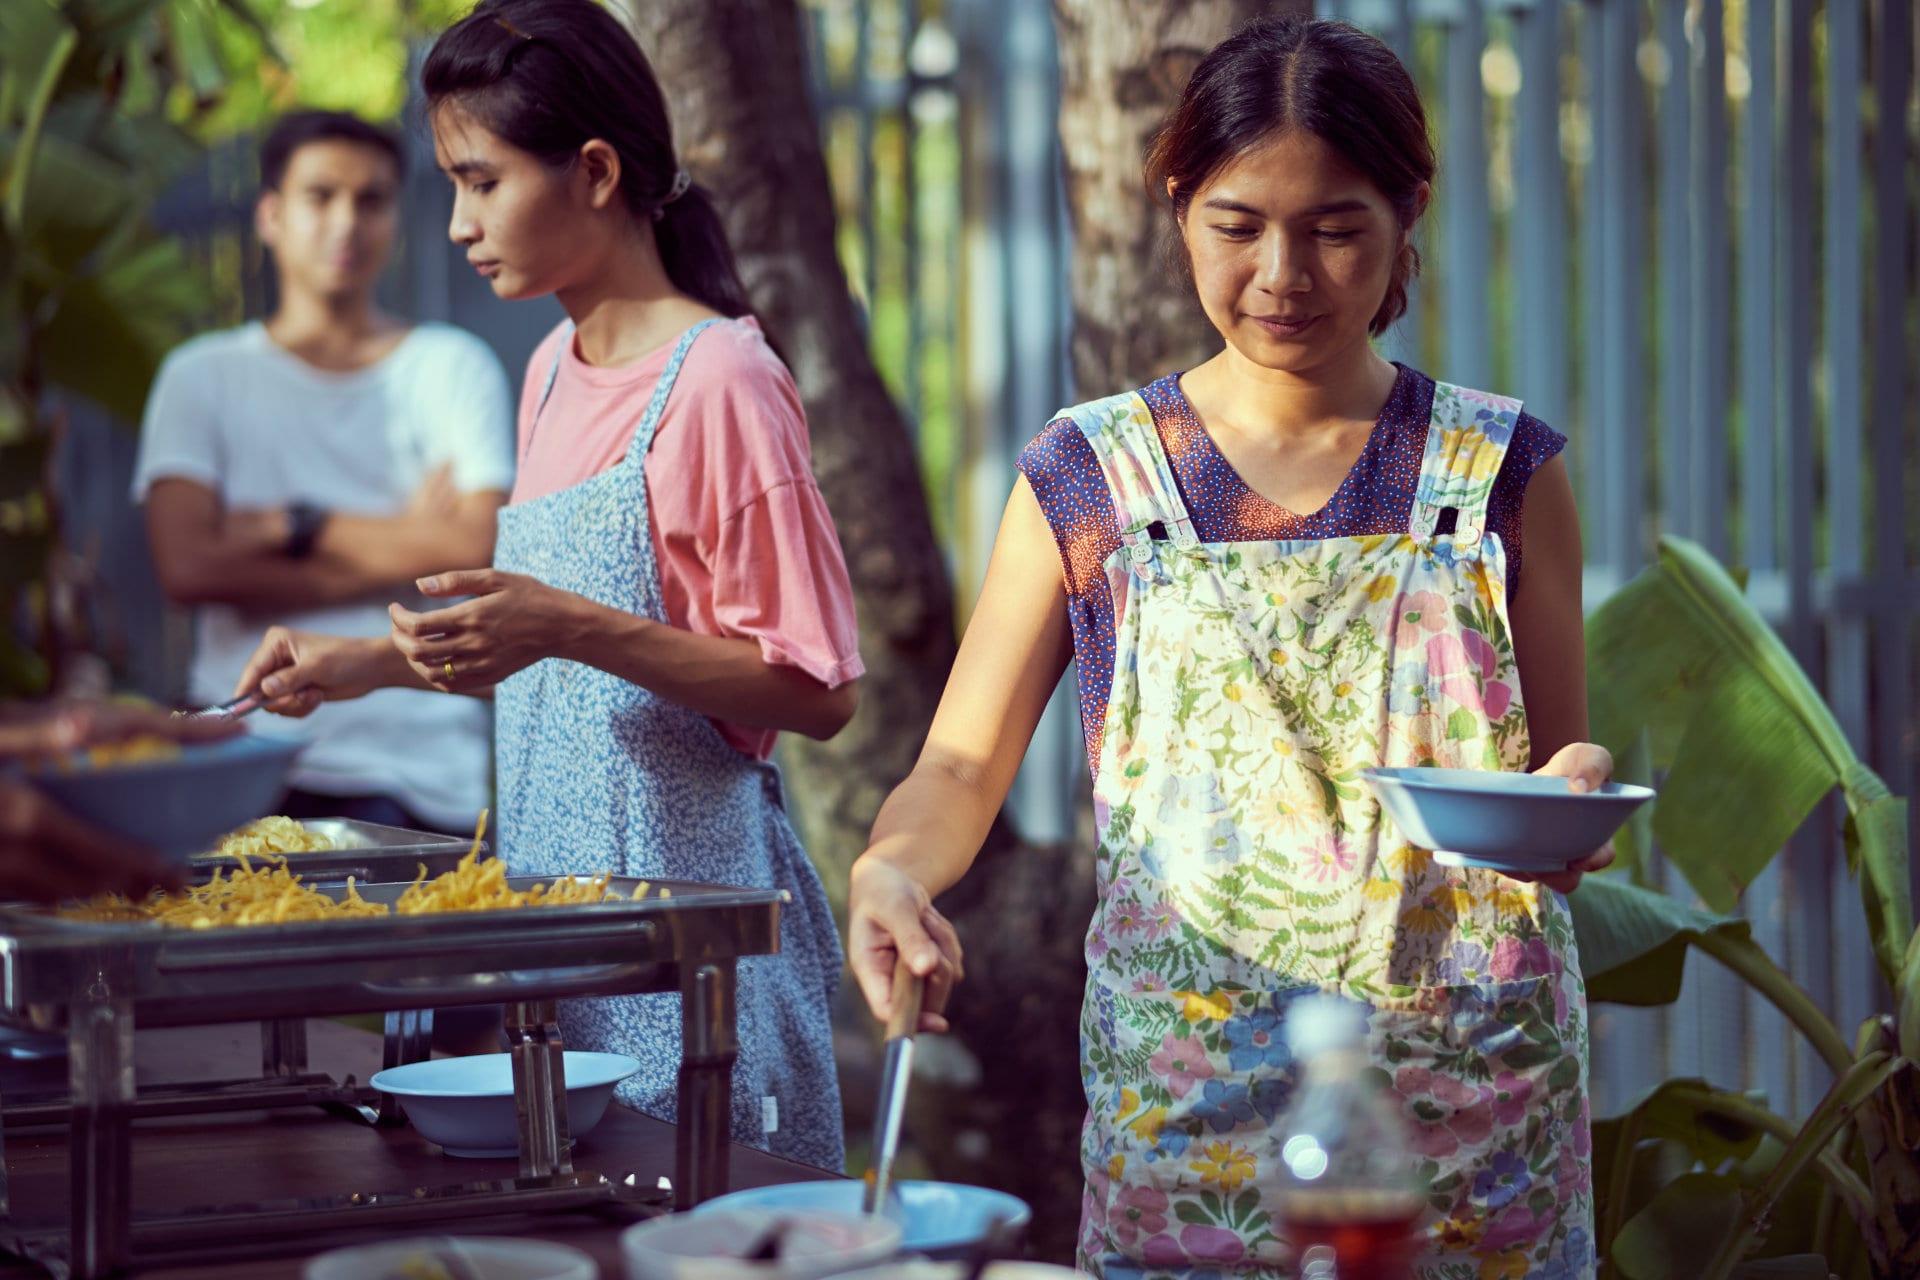 Kulinarne historie: Posiłek na planie (reż.Pen-ek Ratanaruang)/fot. materiały prasowe